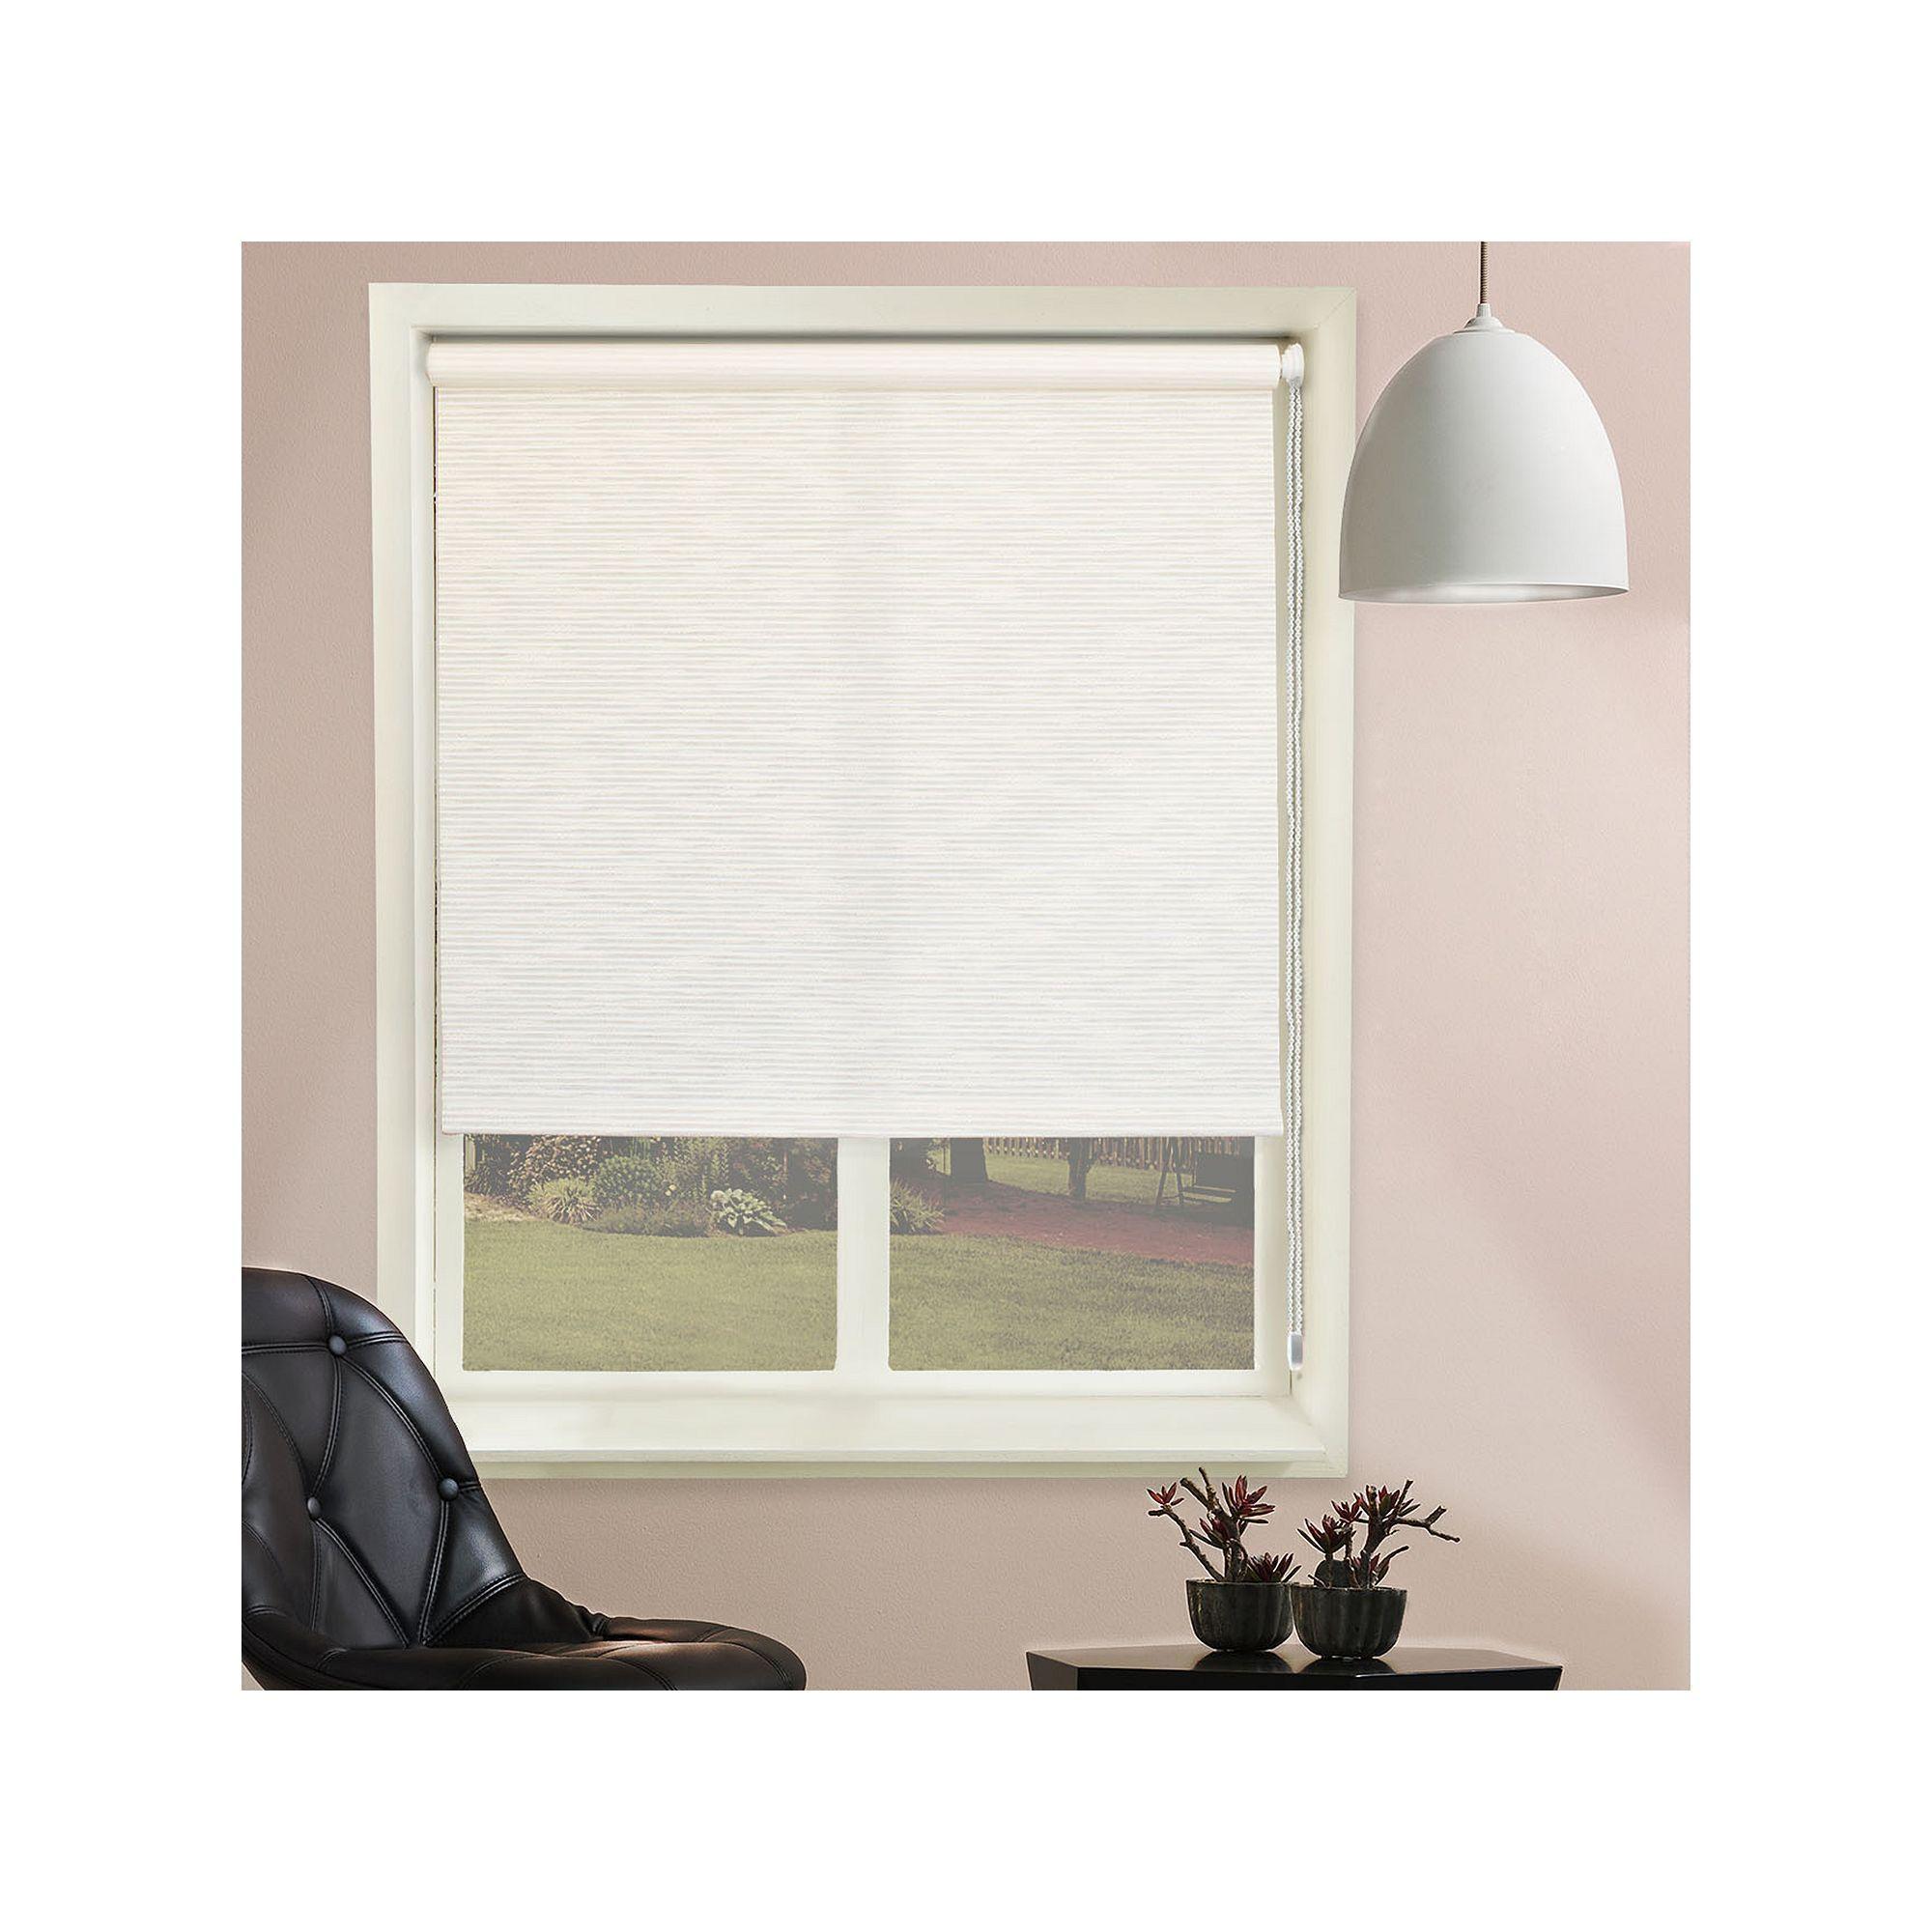 Chicology Textured Roller Shade White Blindsforwindowsapartments House Blinds Blinds For Windows Graber Blinds